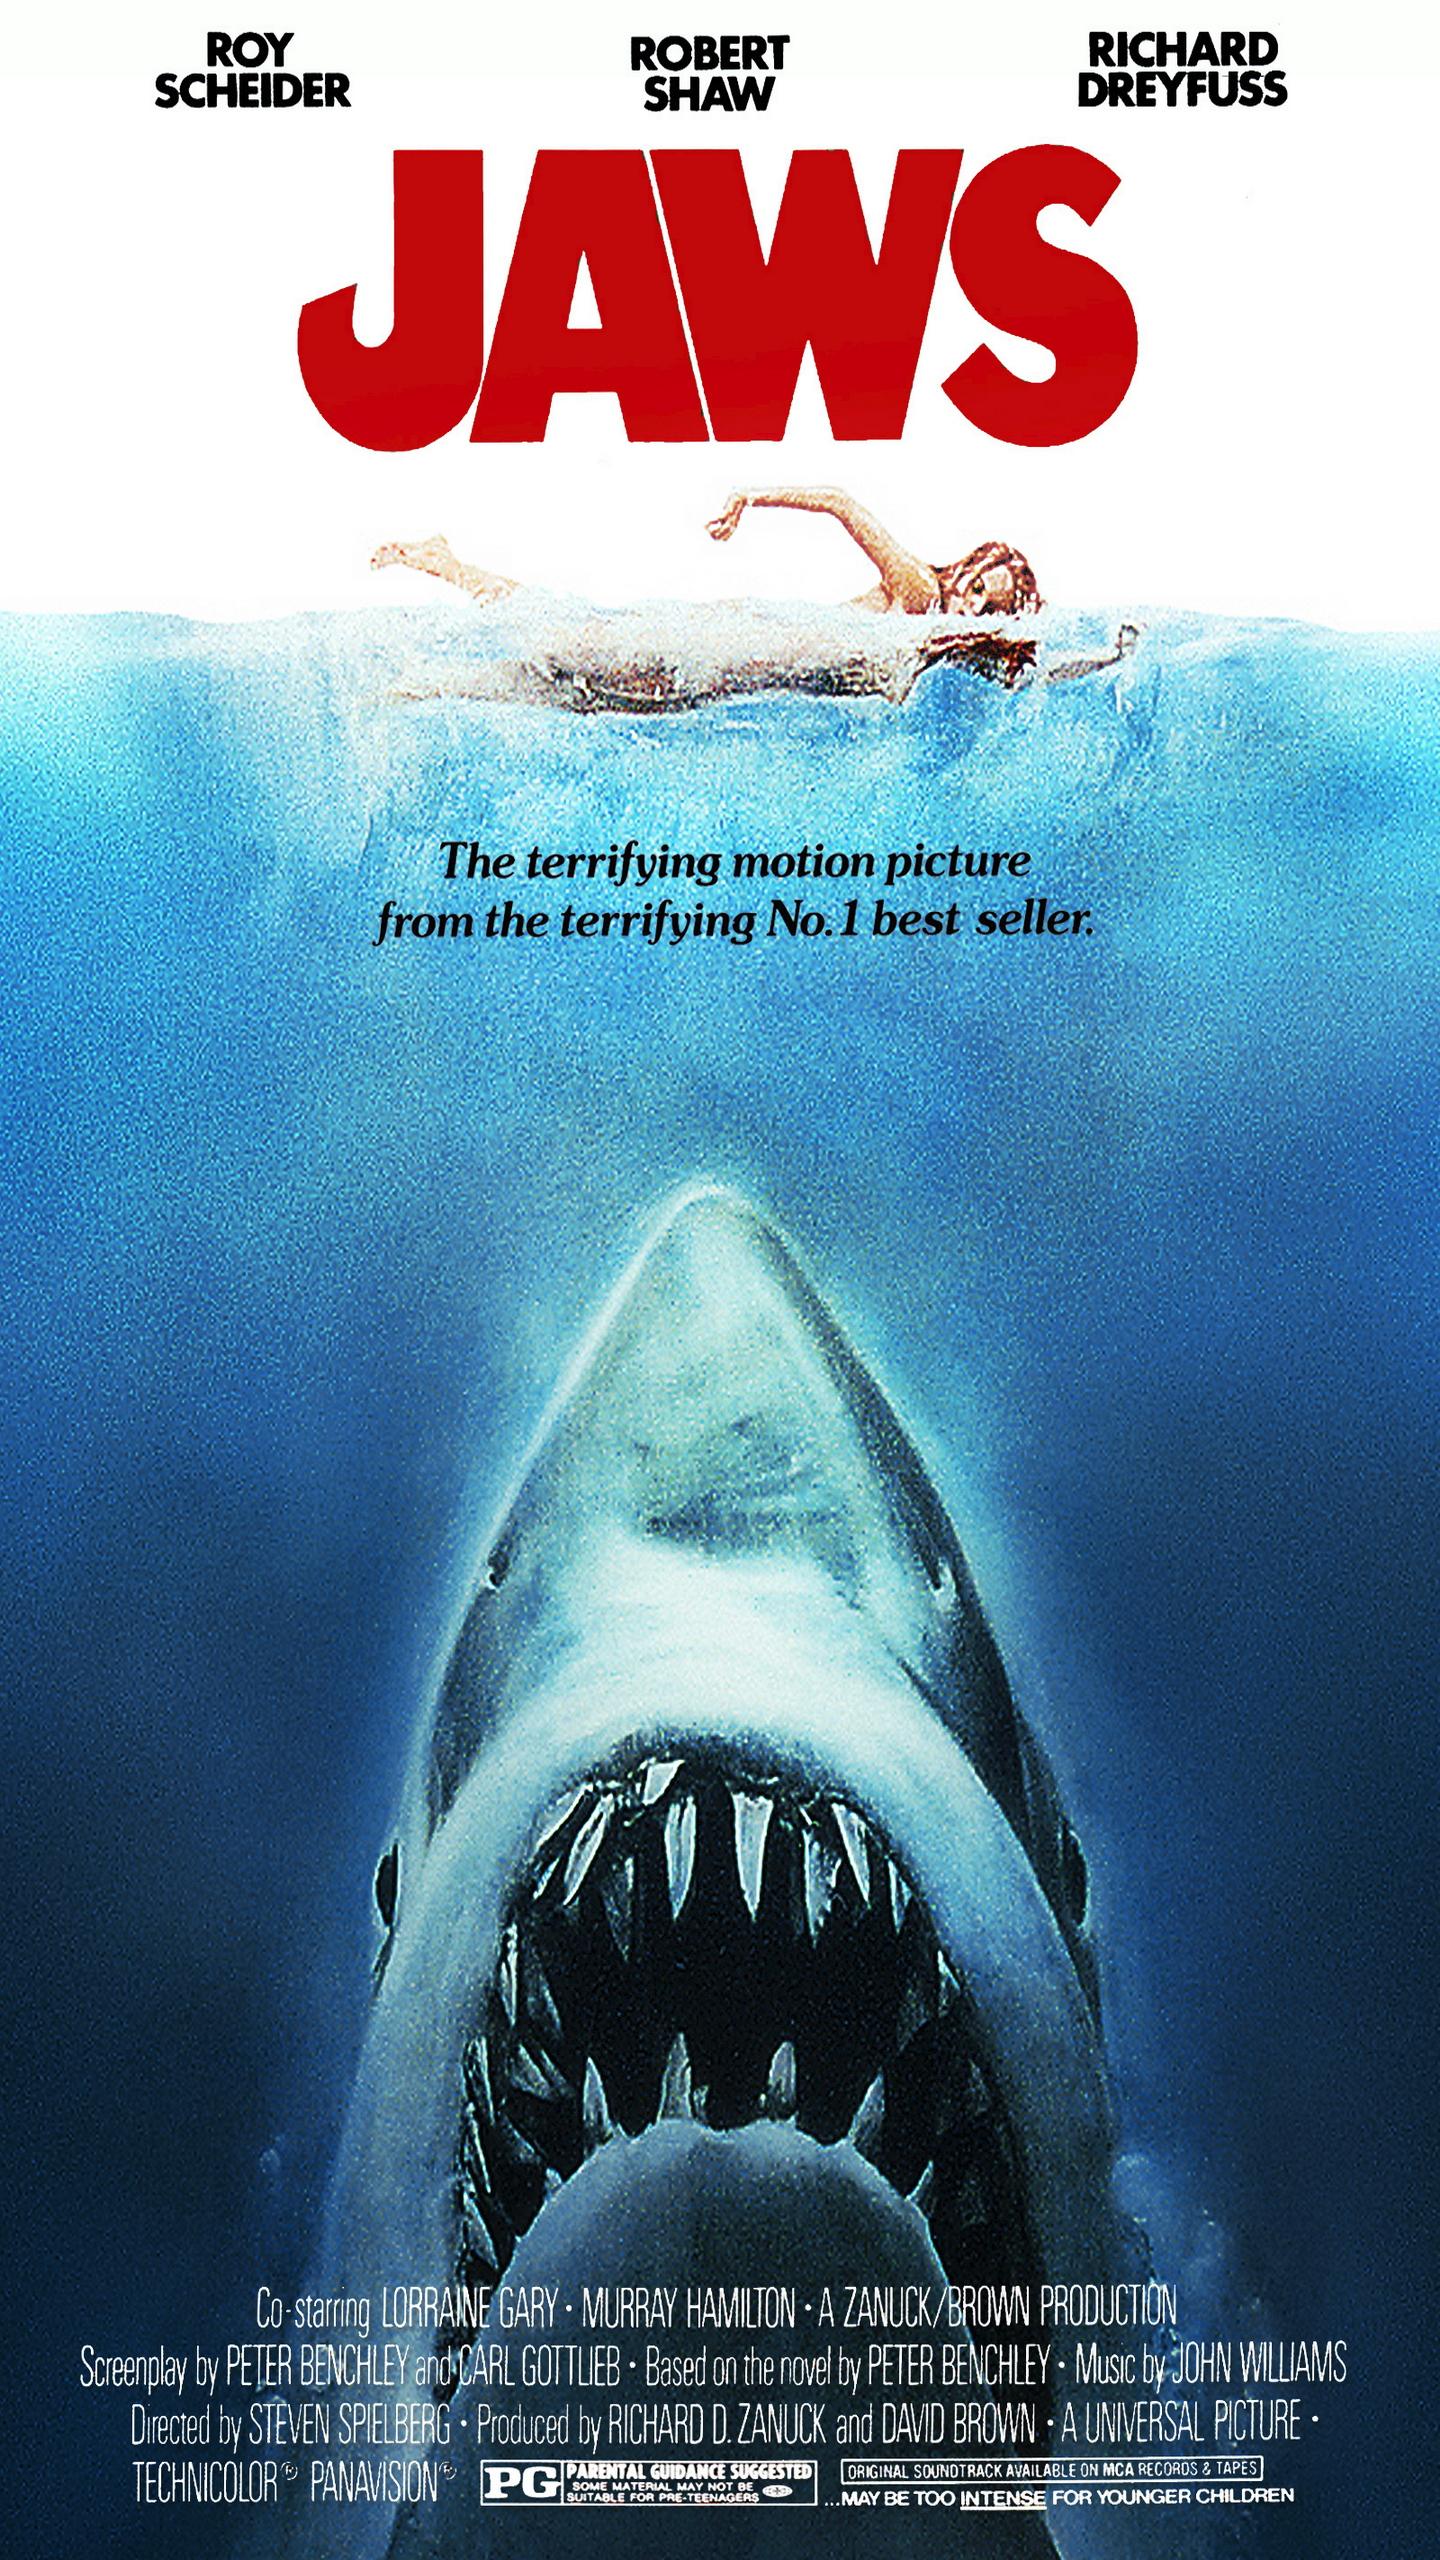 [37+] Jaws HD Wallpaper on WallpaperSafari